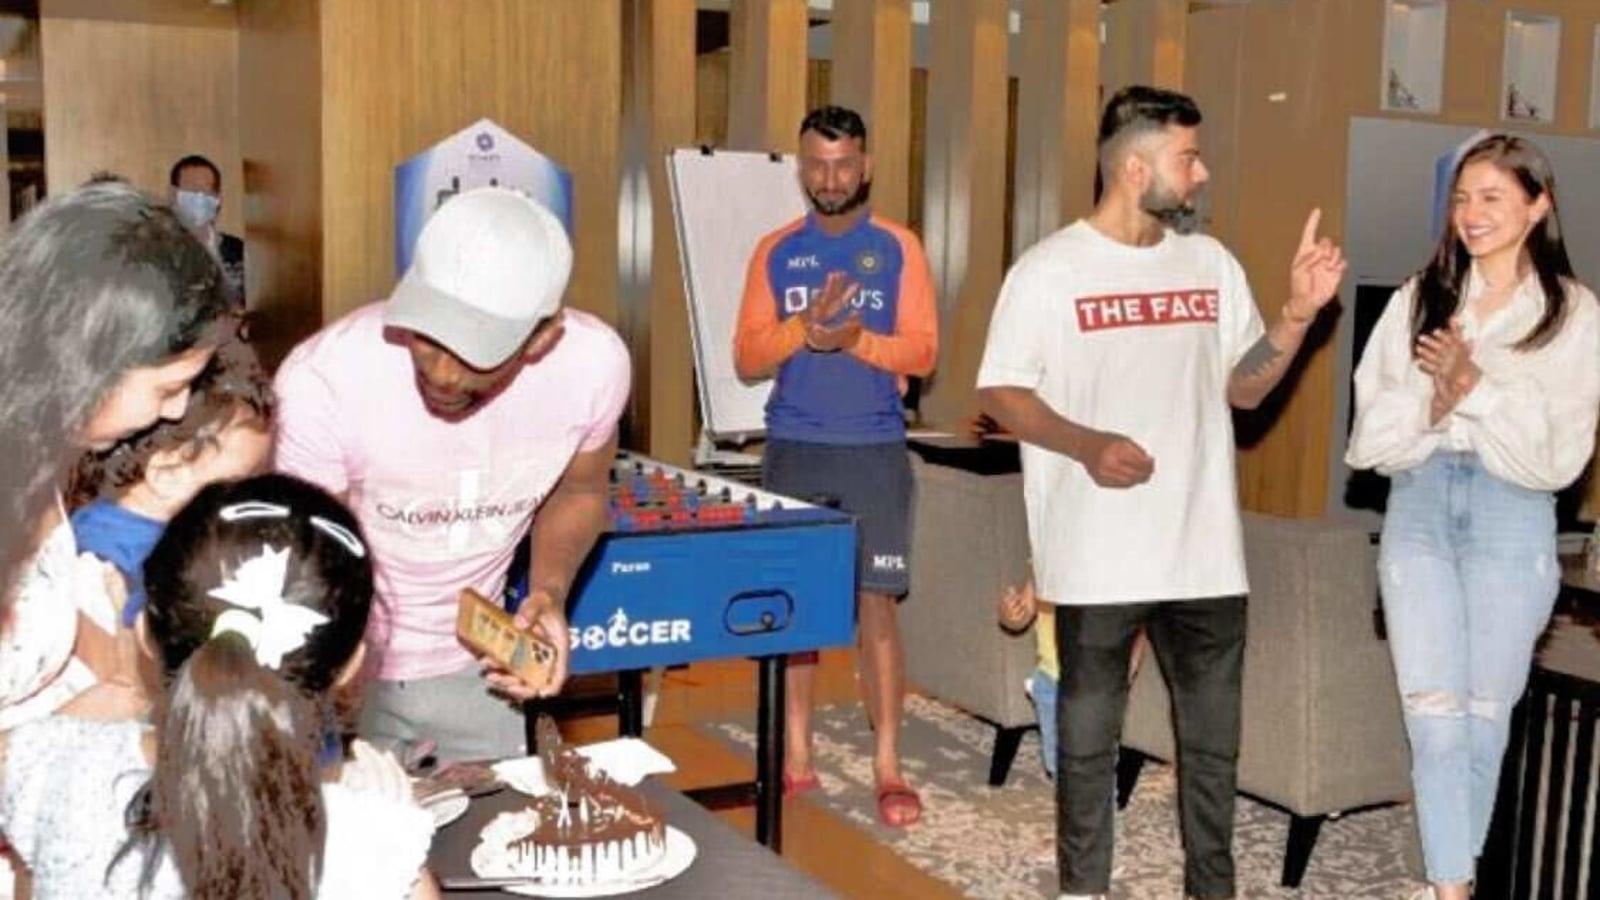 Virat Kohli and Anushka Sharma let their hair down at Wriddhiman Saha's son's birthday party. See photos - Hindustan Times